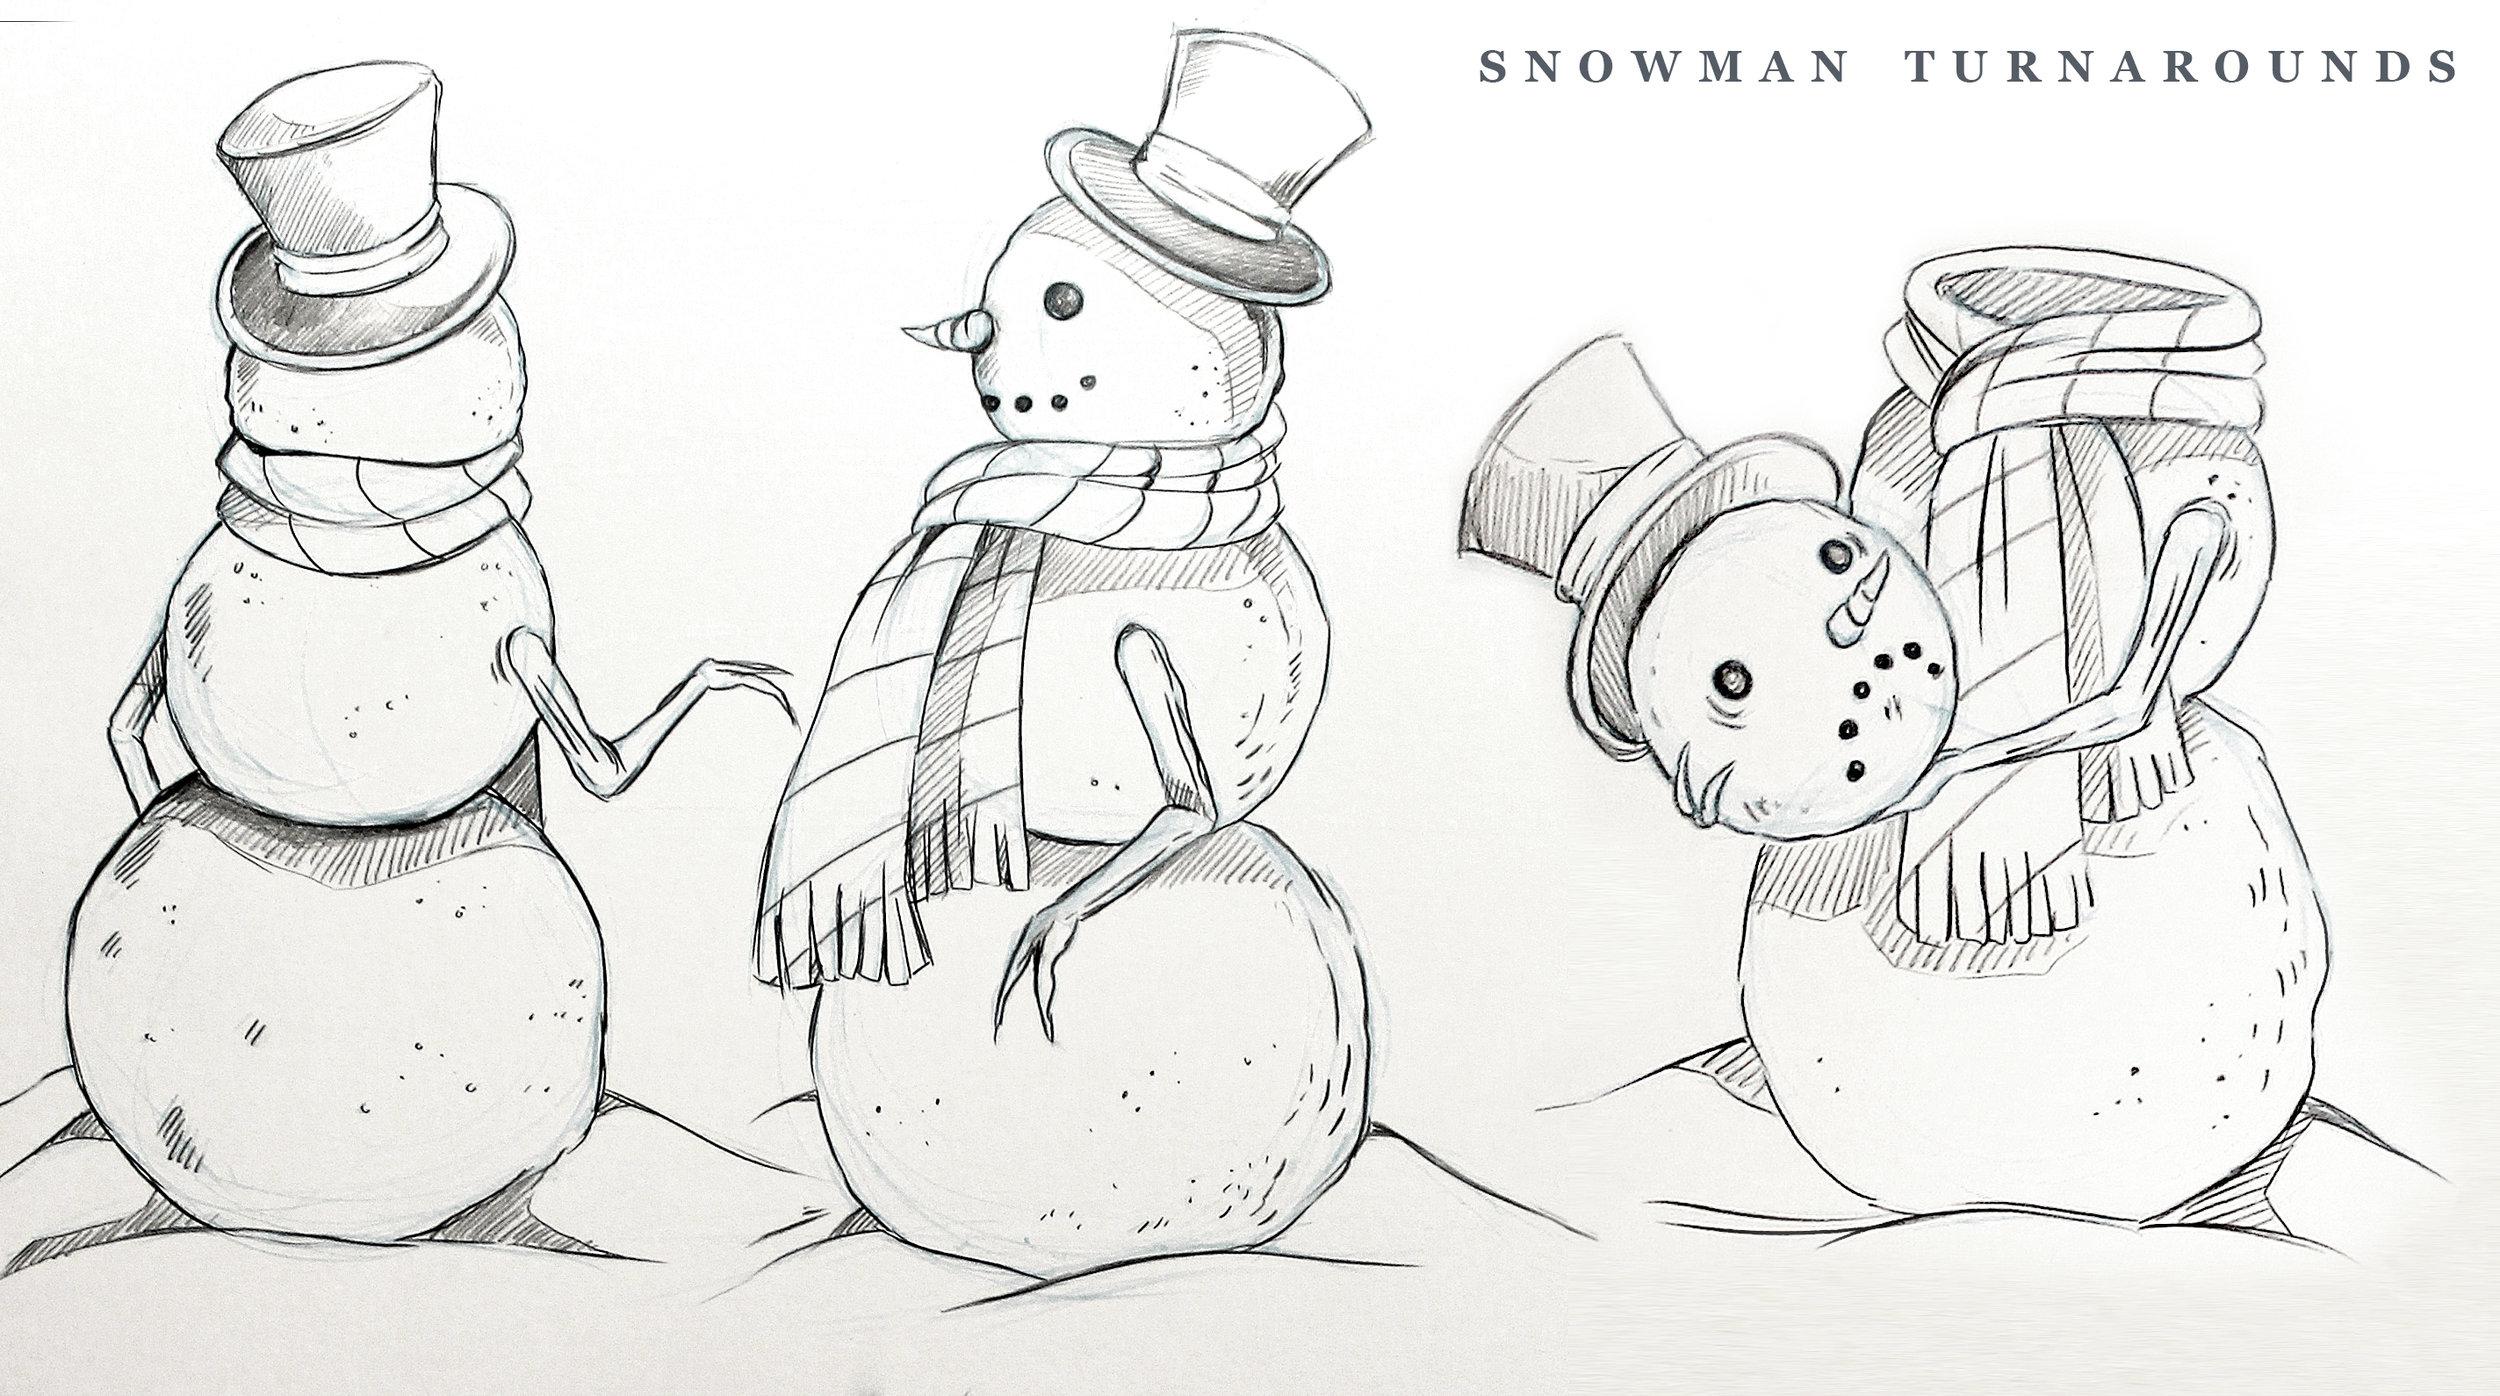 snowman-turnarounds.jpg